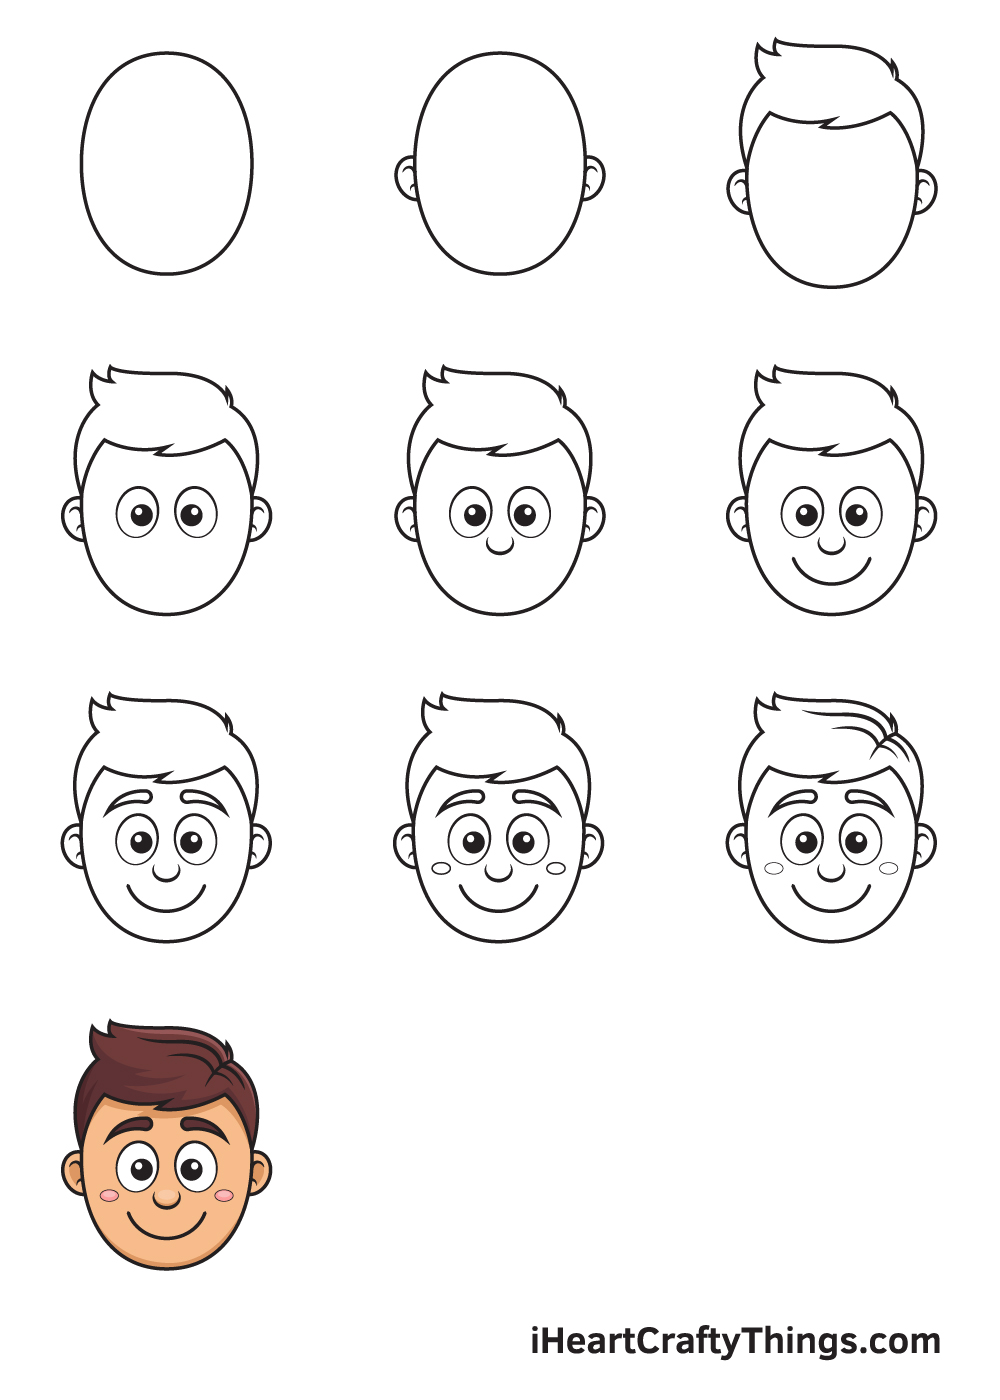 Cartoon Face in 9 Easy Steps